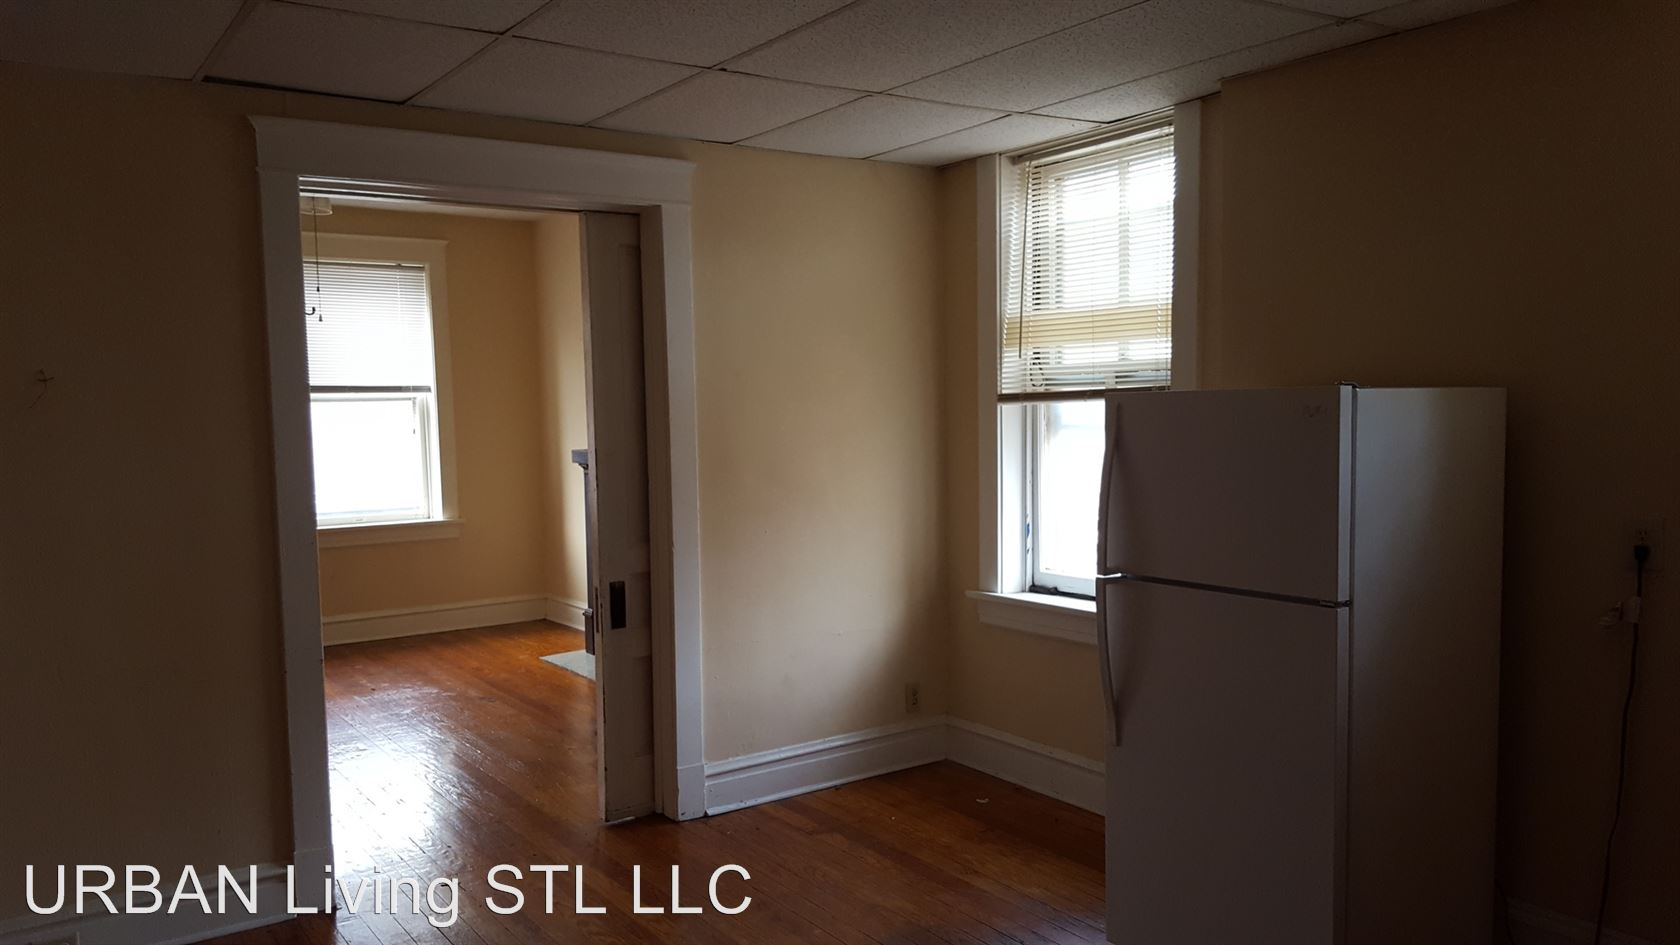 Similar Apartment at 4740 42 S. Broadway